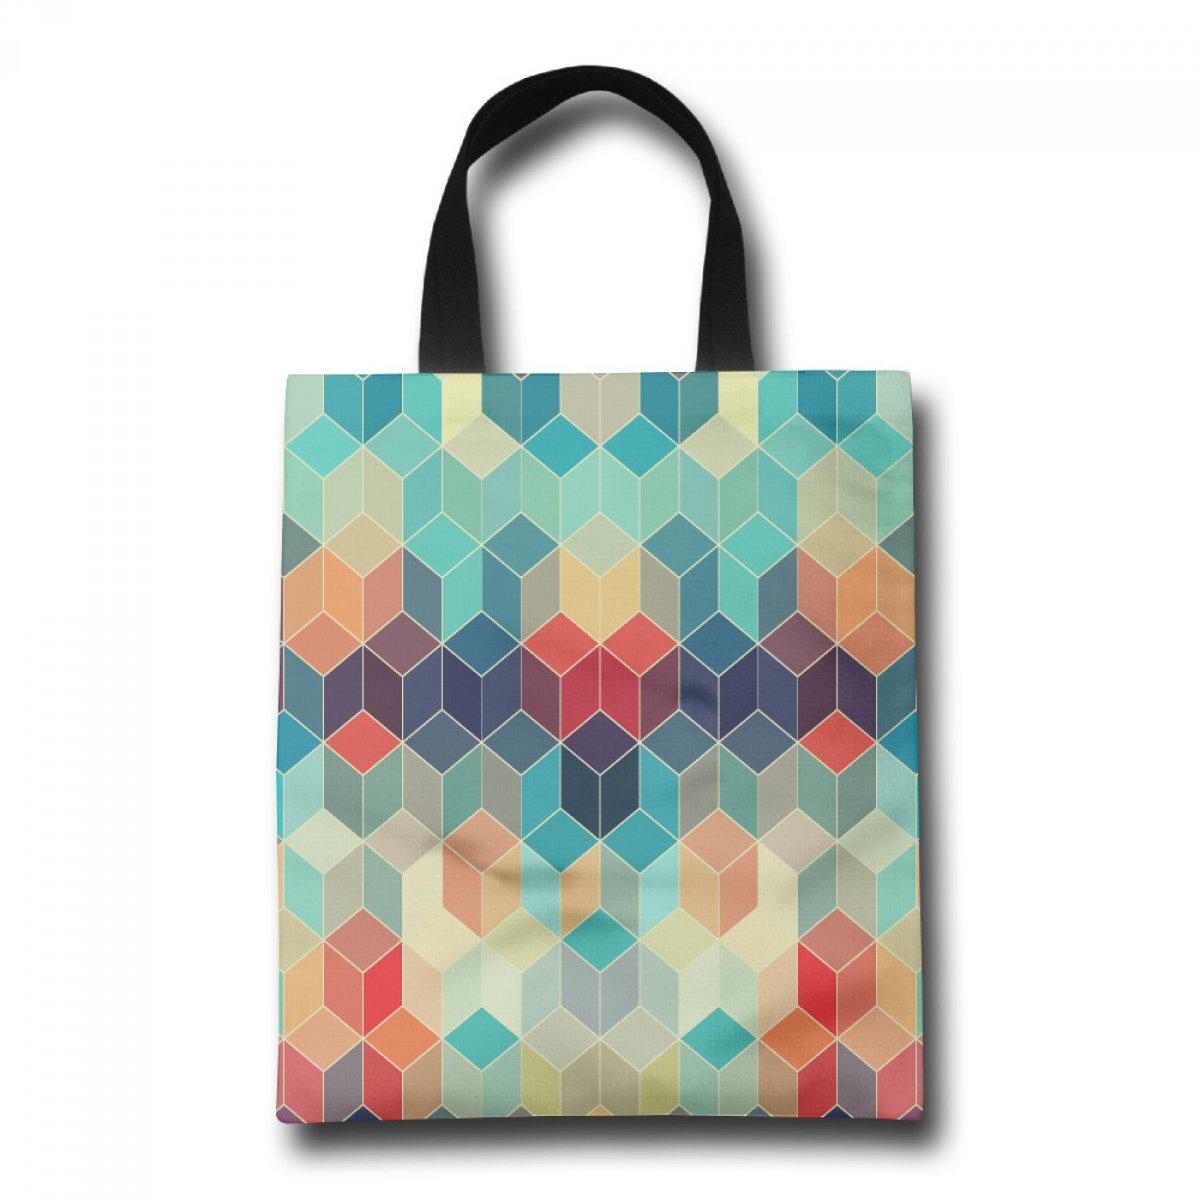 PhoRock Women Canvas Beach Tote Colorful Diamonds Printed Tote Bag GWJH037 0